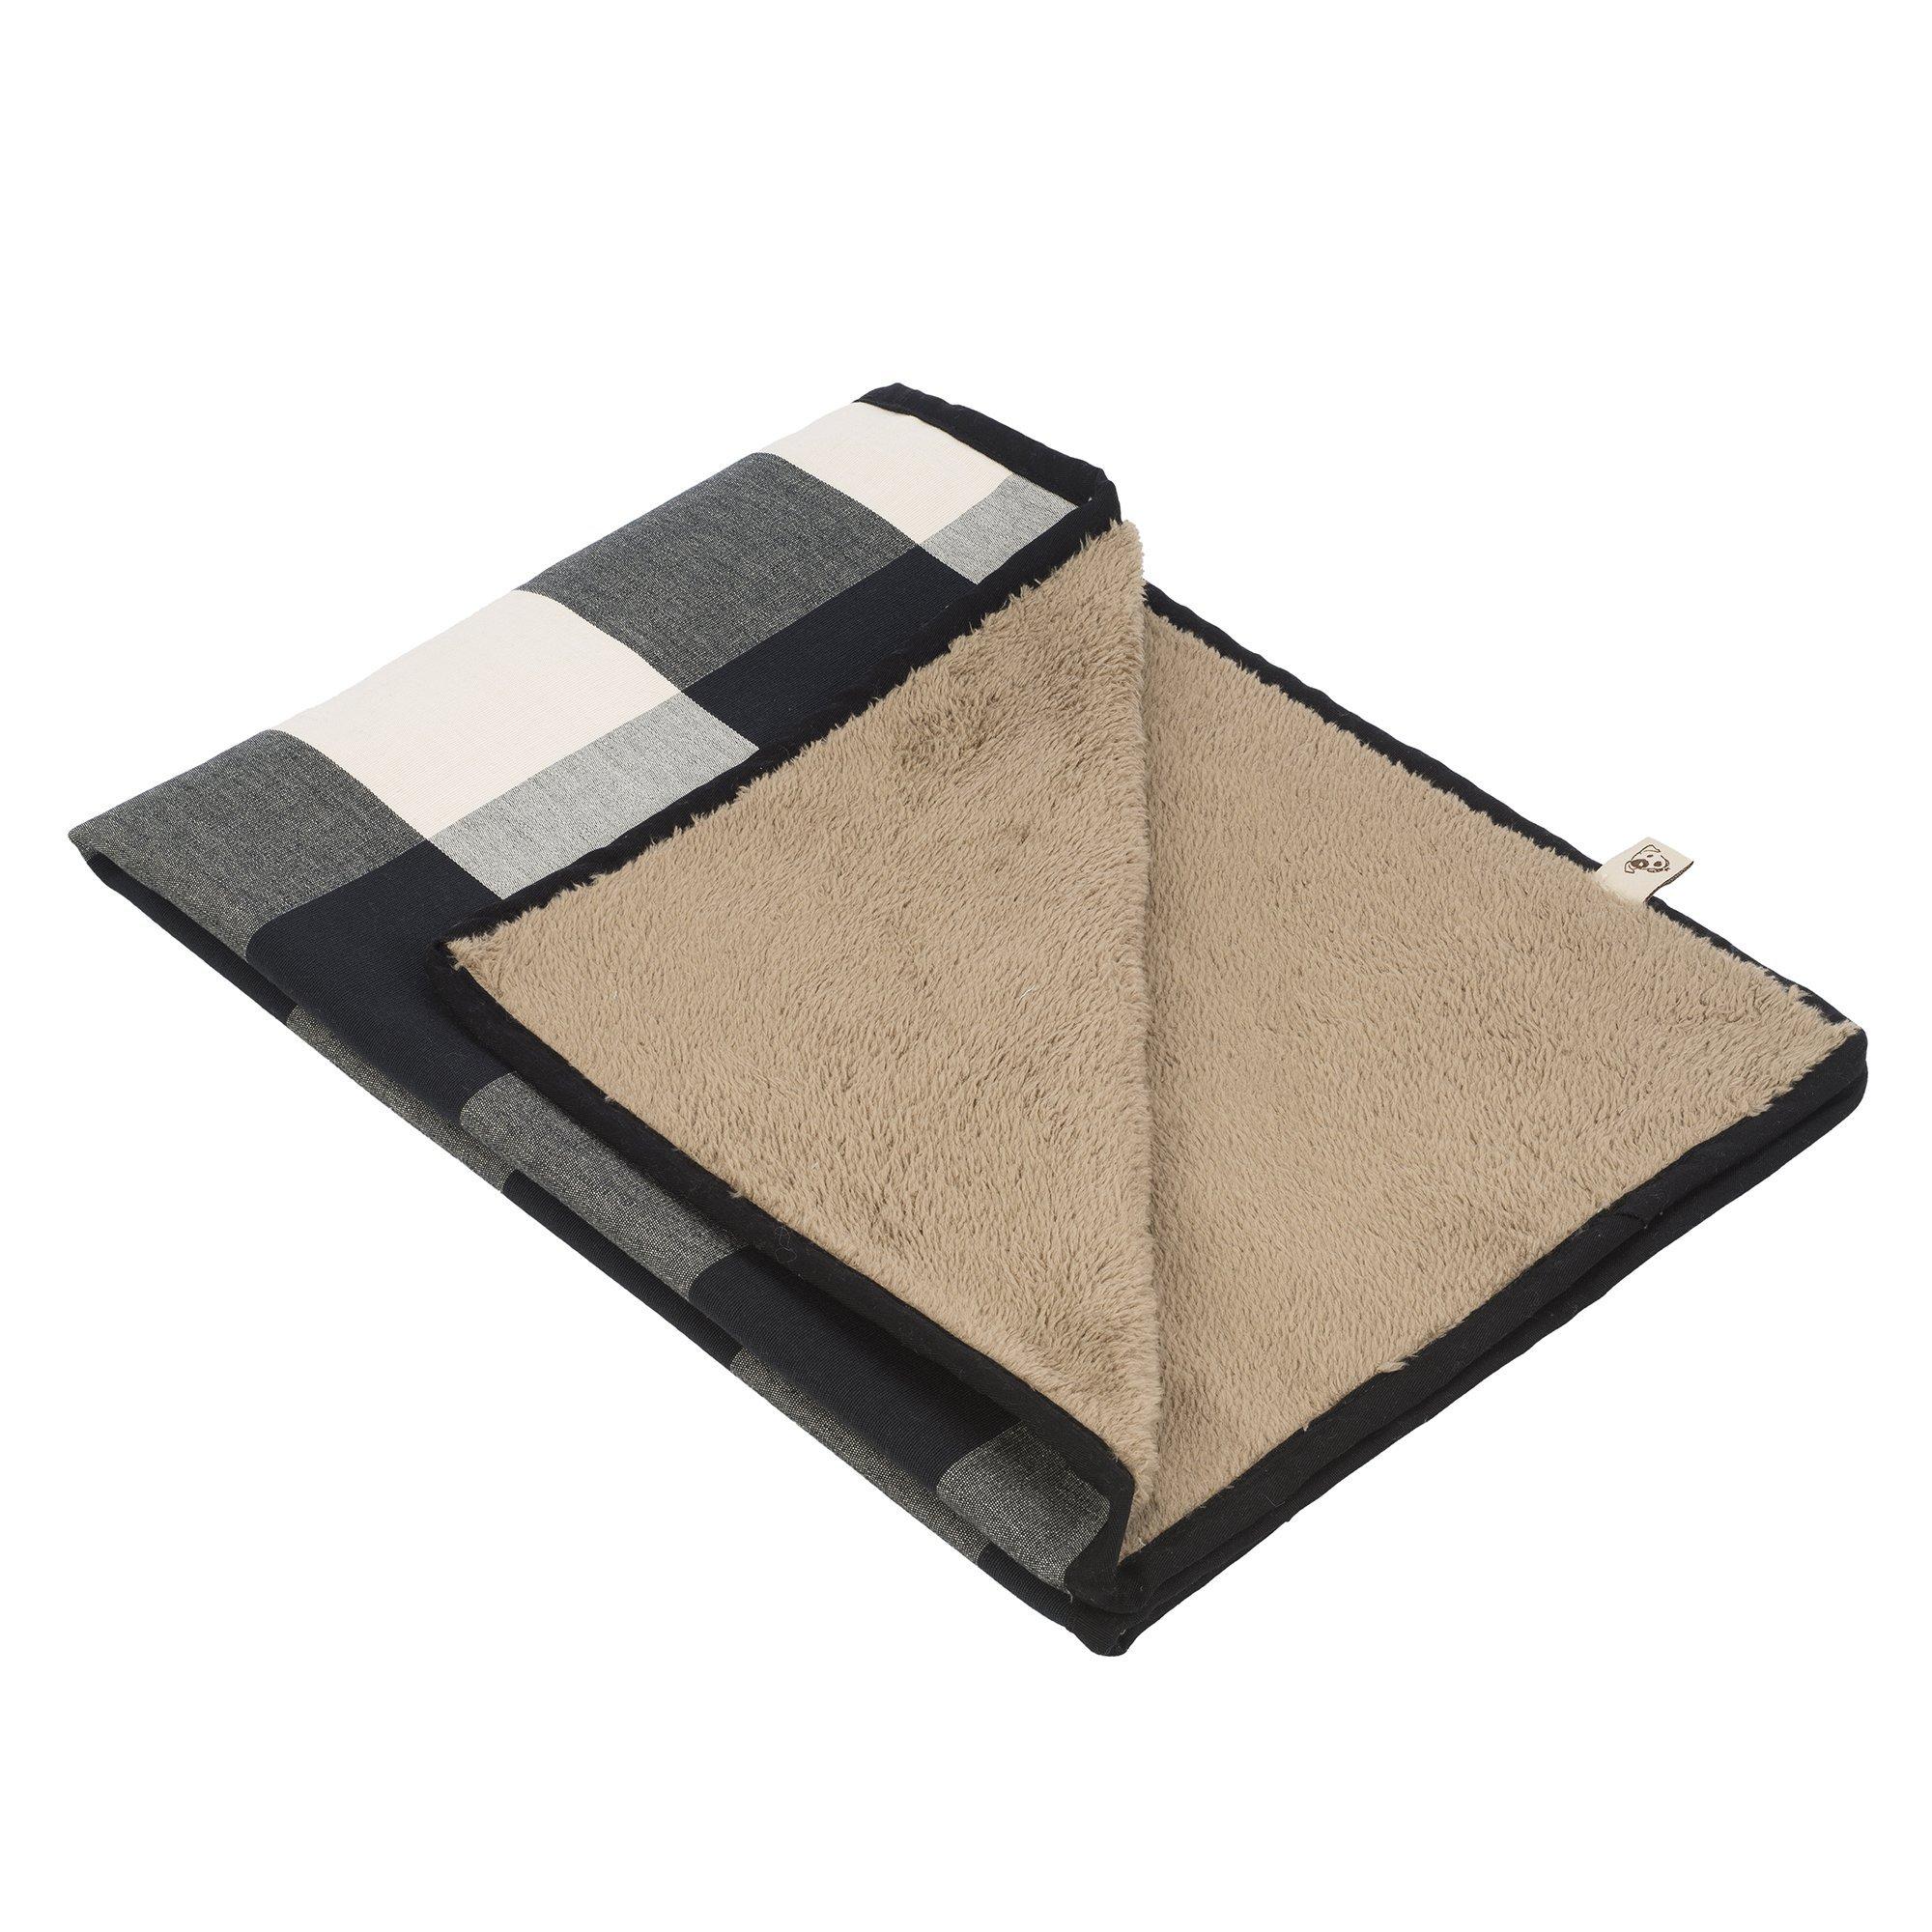 Jax and Bones Buffalo Check Standard Pet Blanket, Small, Black